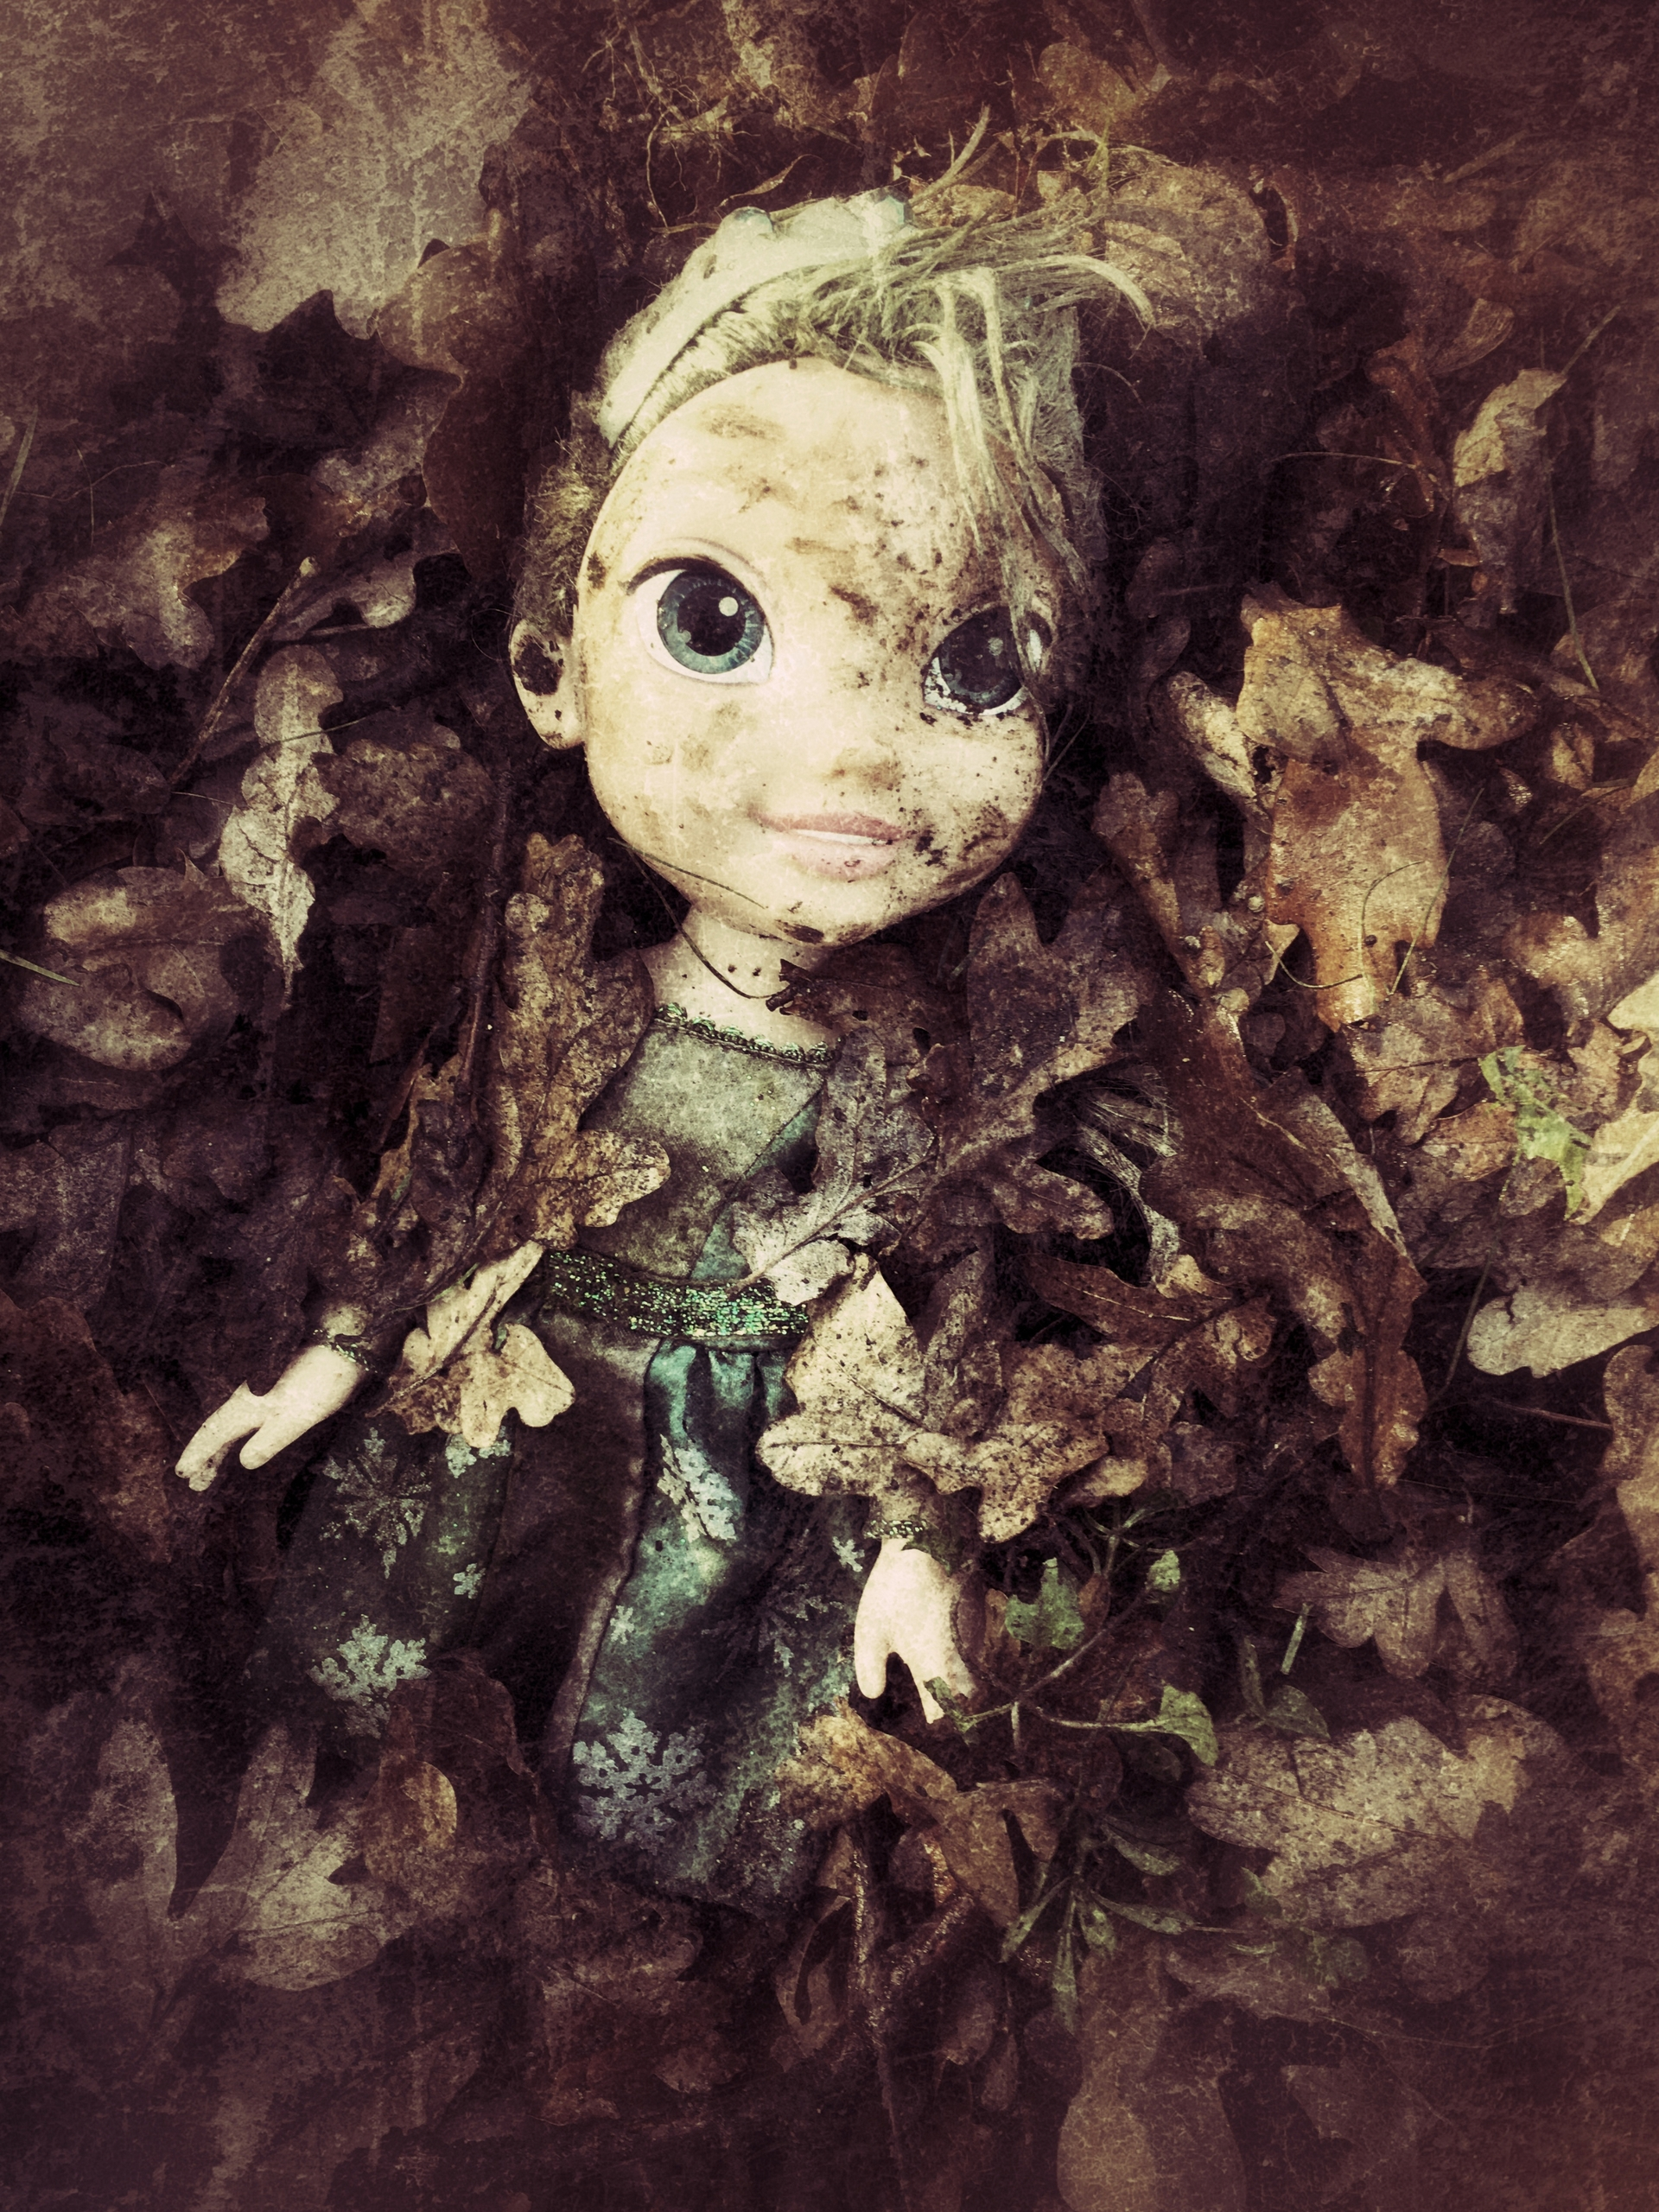 Creepy Doll (2019 - phil_levene | ello